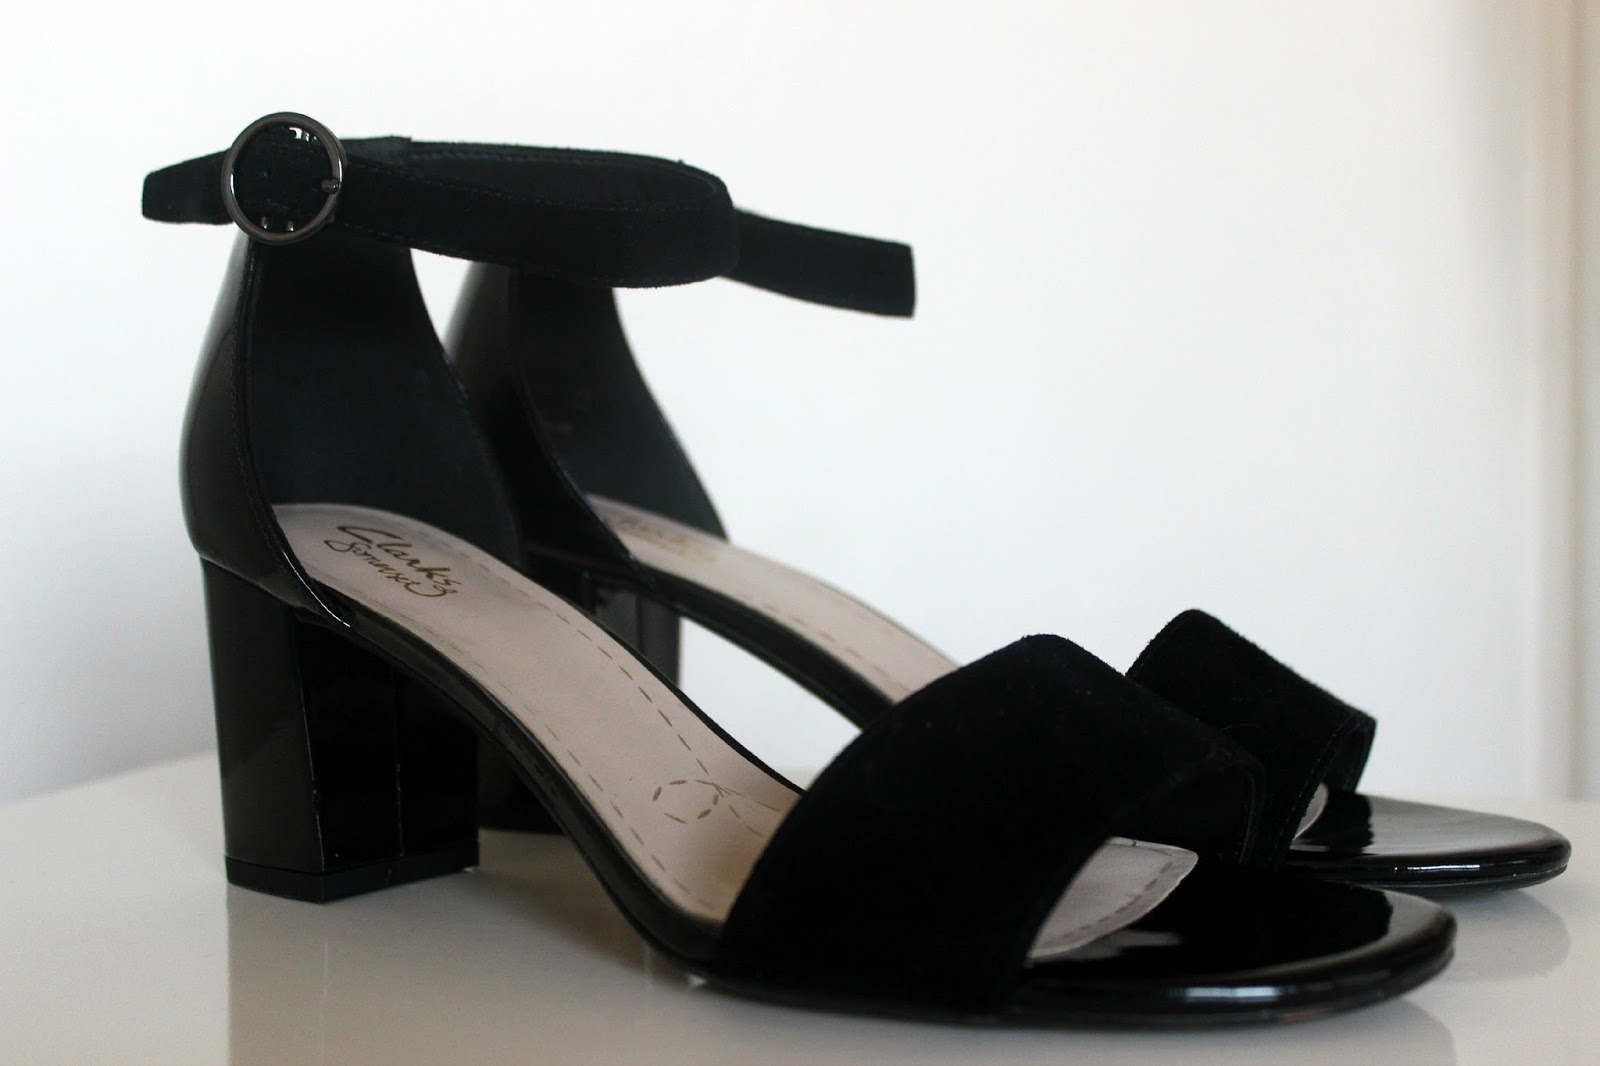 fae7389153d Clarks Susie Deva Black Combination Suede Sandals  £50